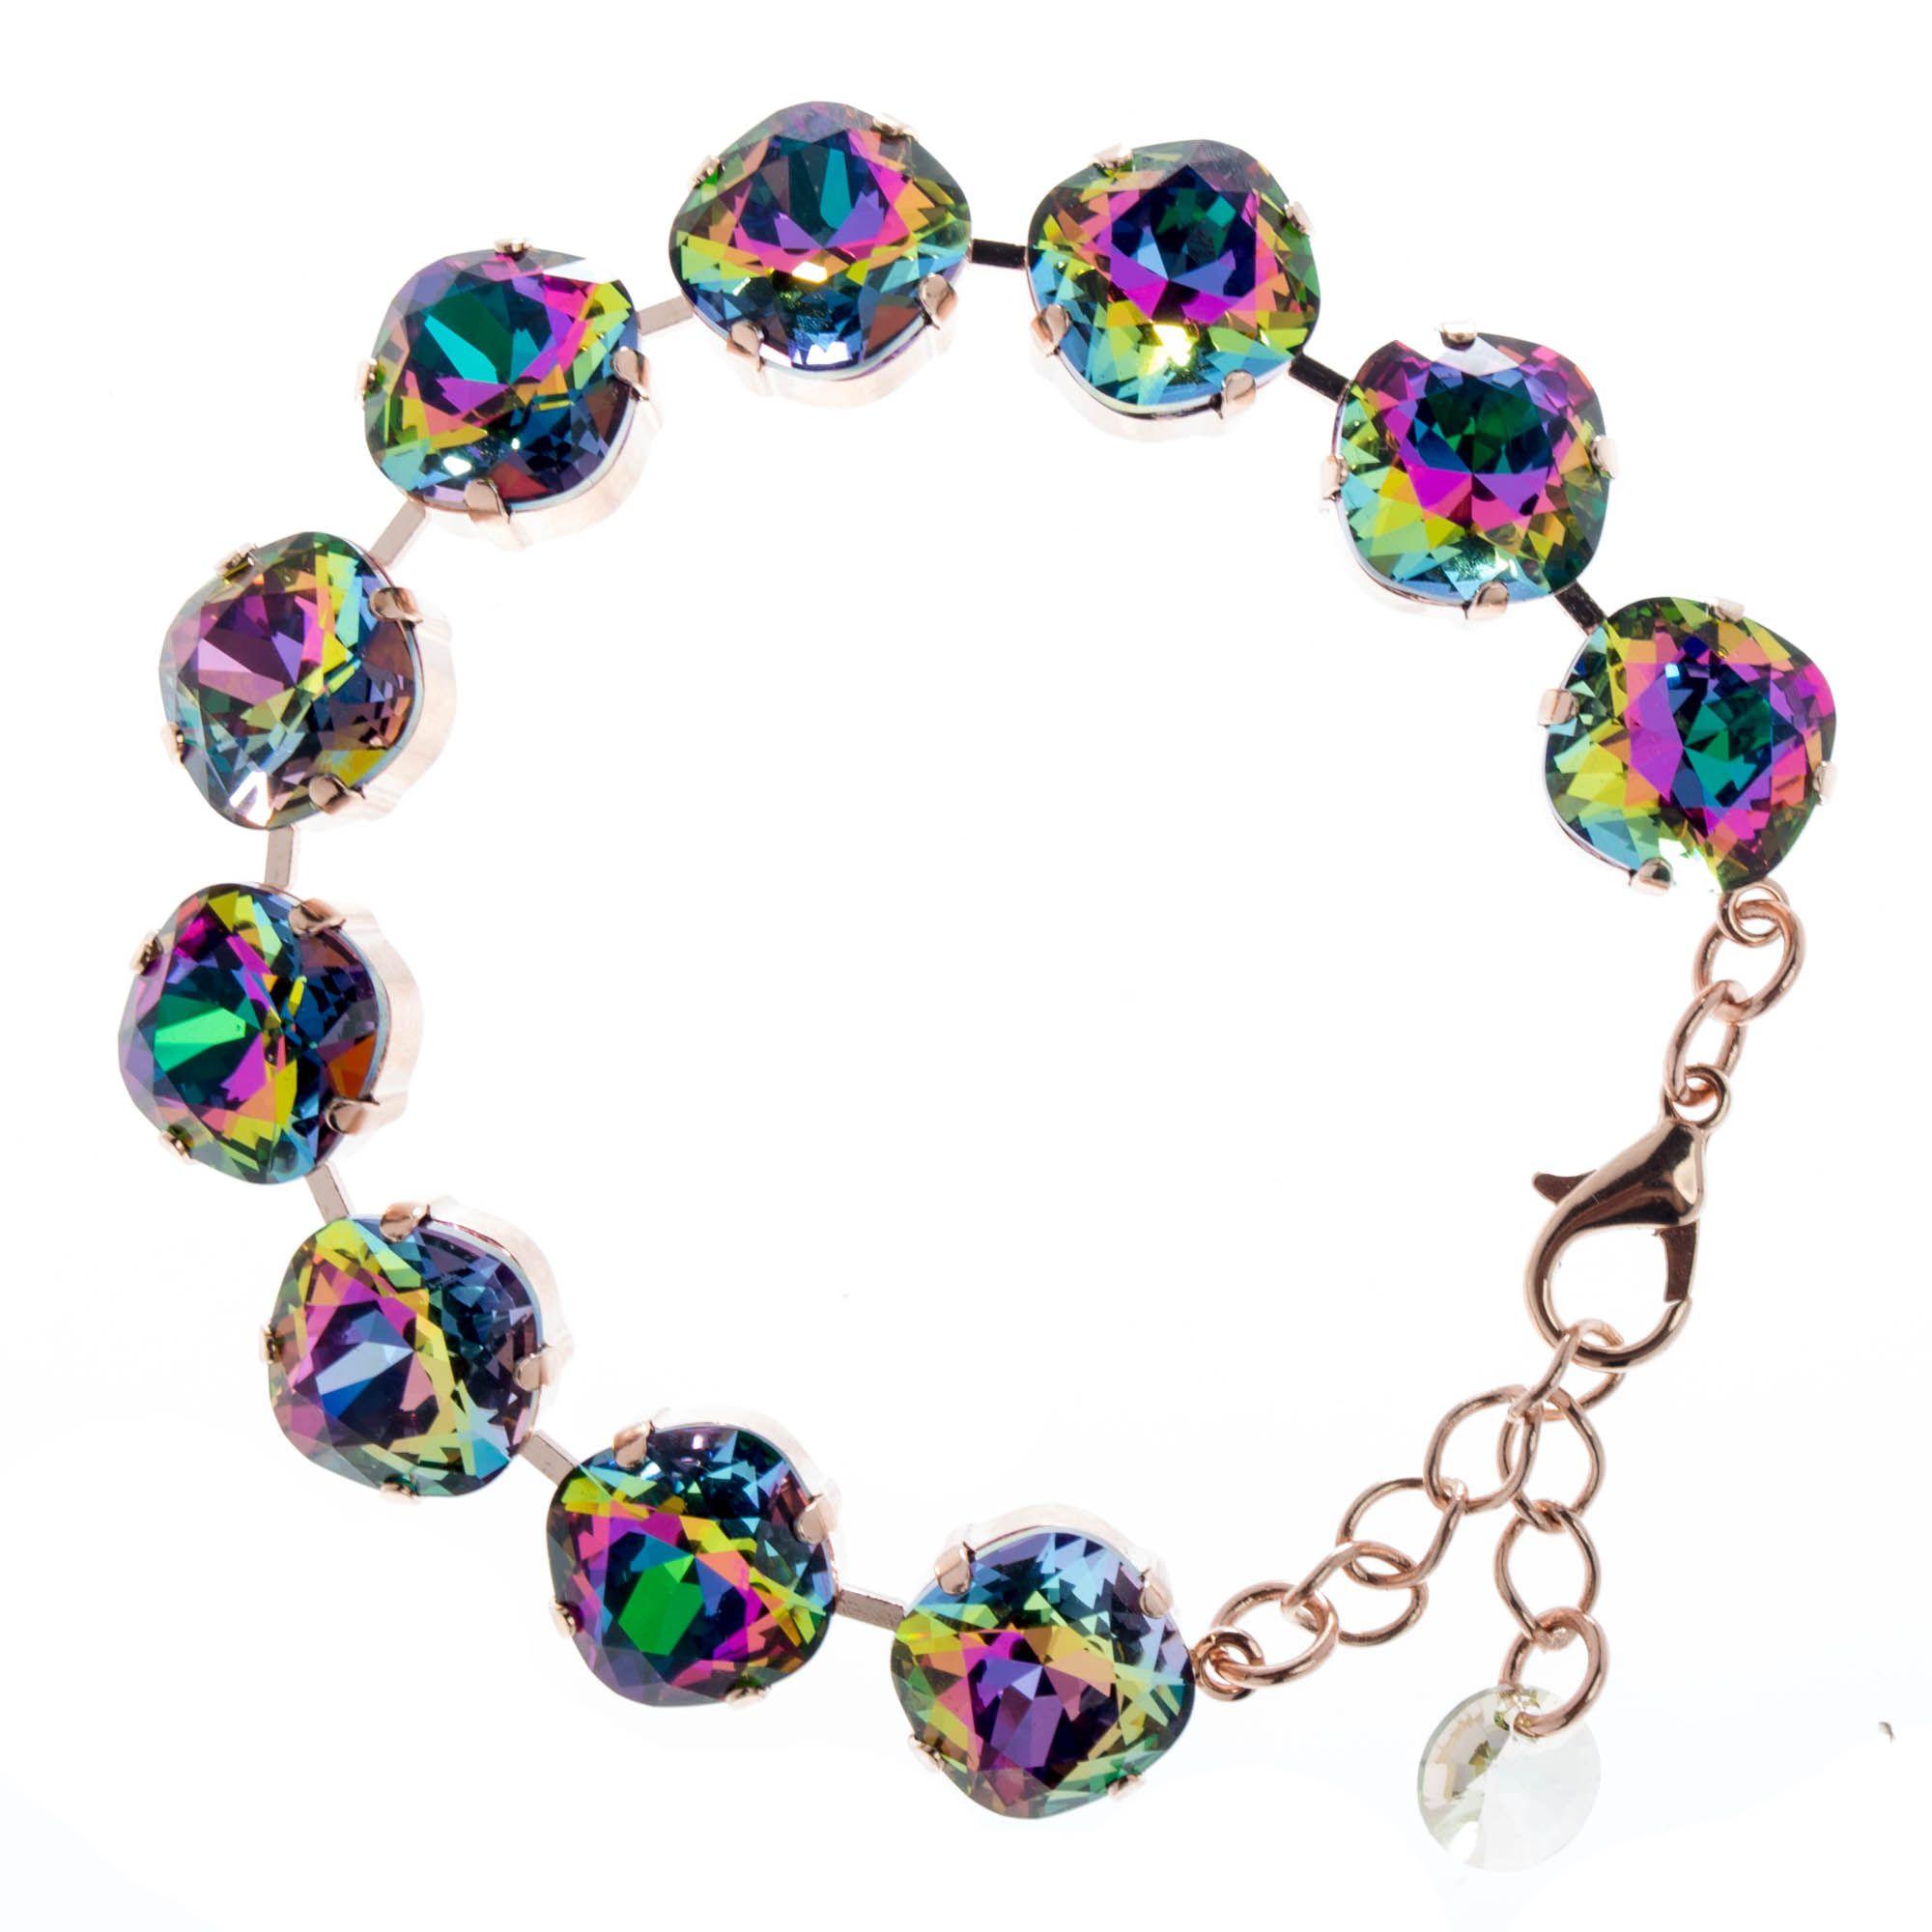 Lisa Marie Jewelry 12mm Square Swarovski Crystal Bracelet - Electra